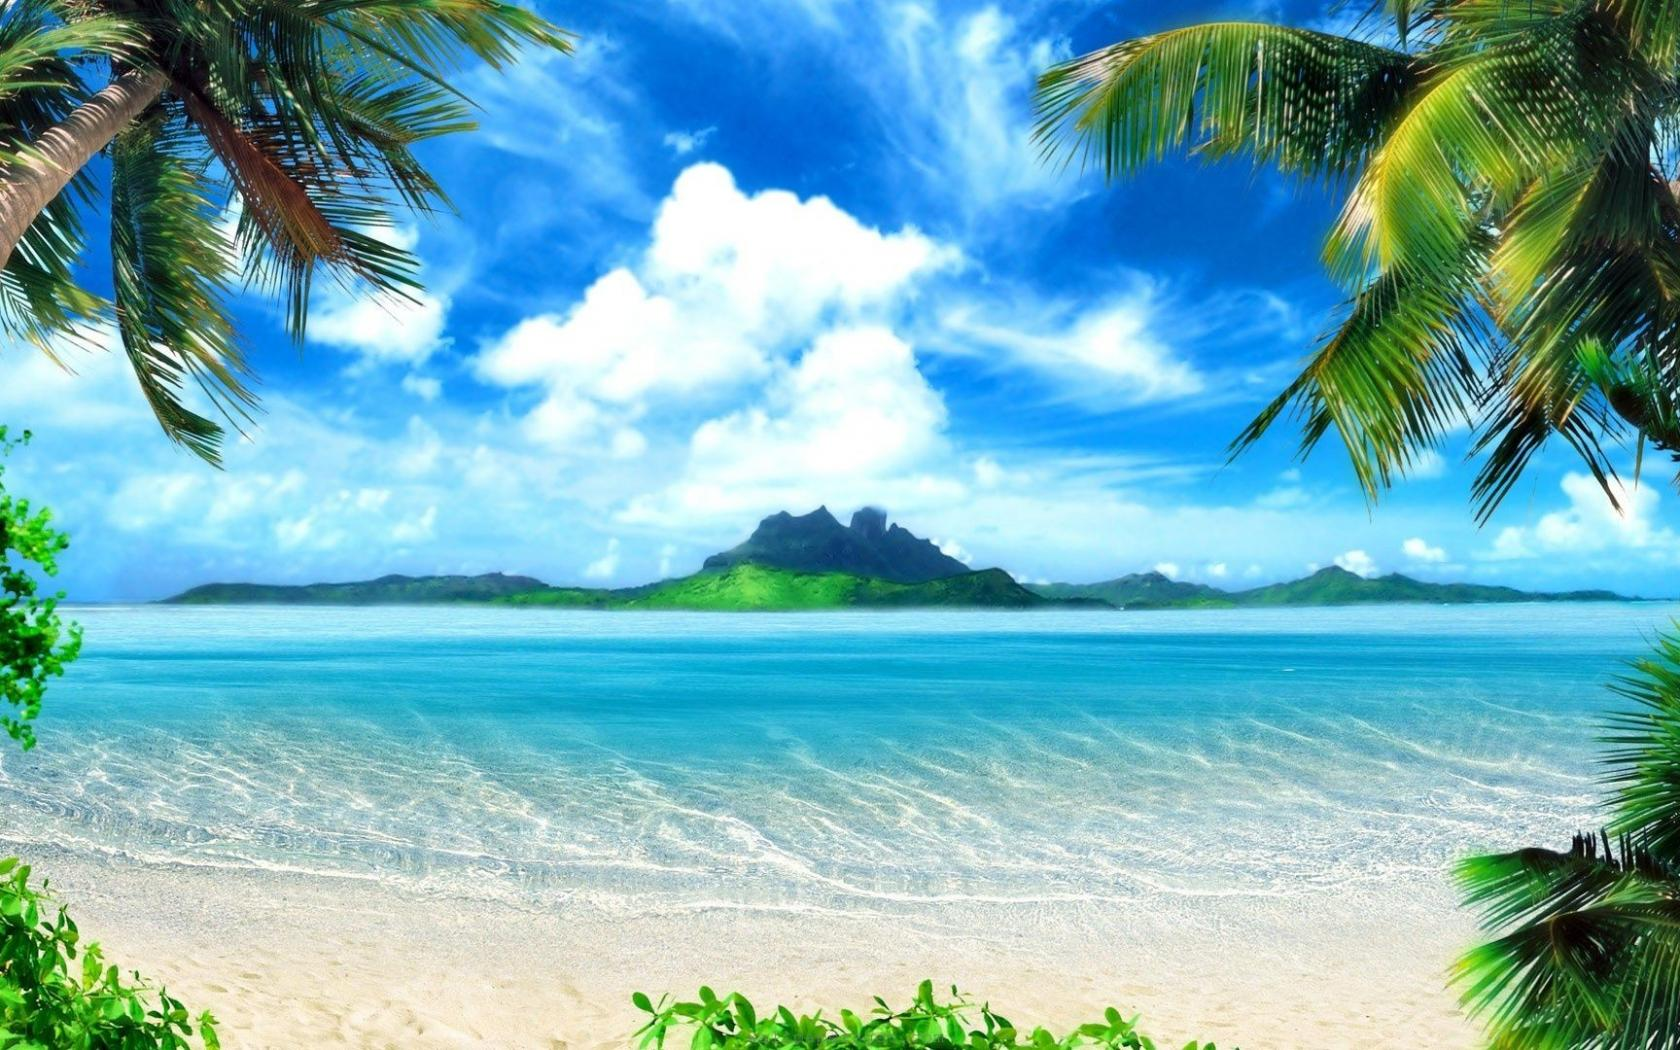 Beautiful Beach Islands Hd Photography Wallpaper Wallpapers Gallery 1680x1050